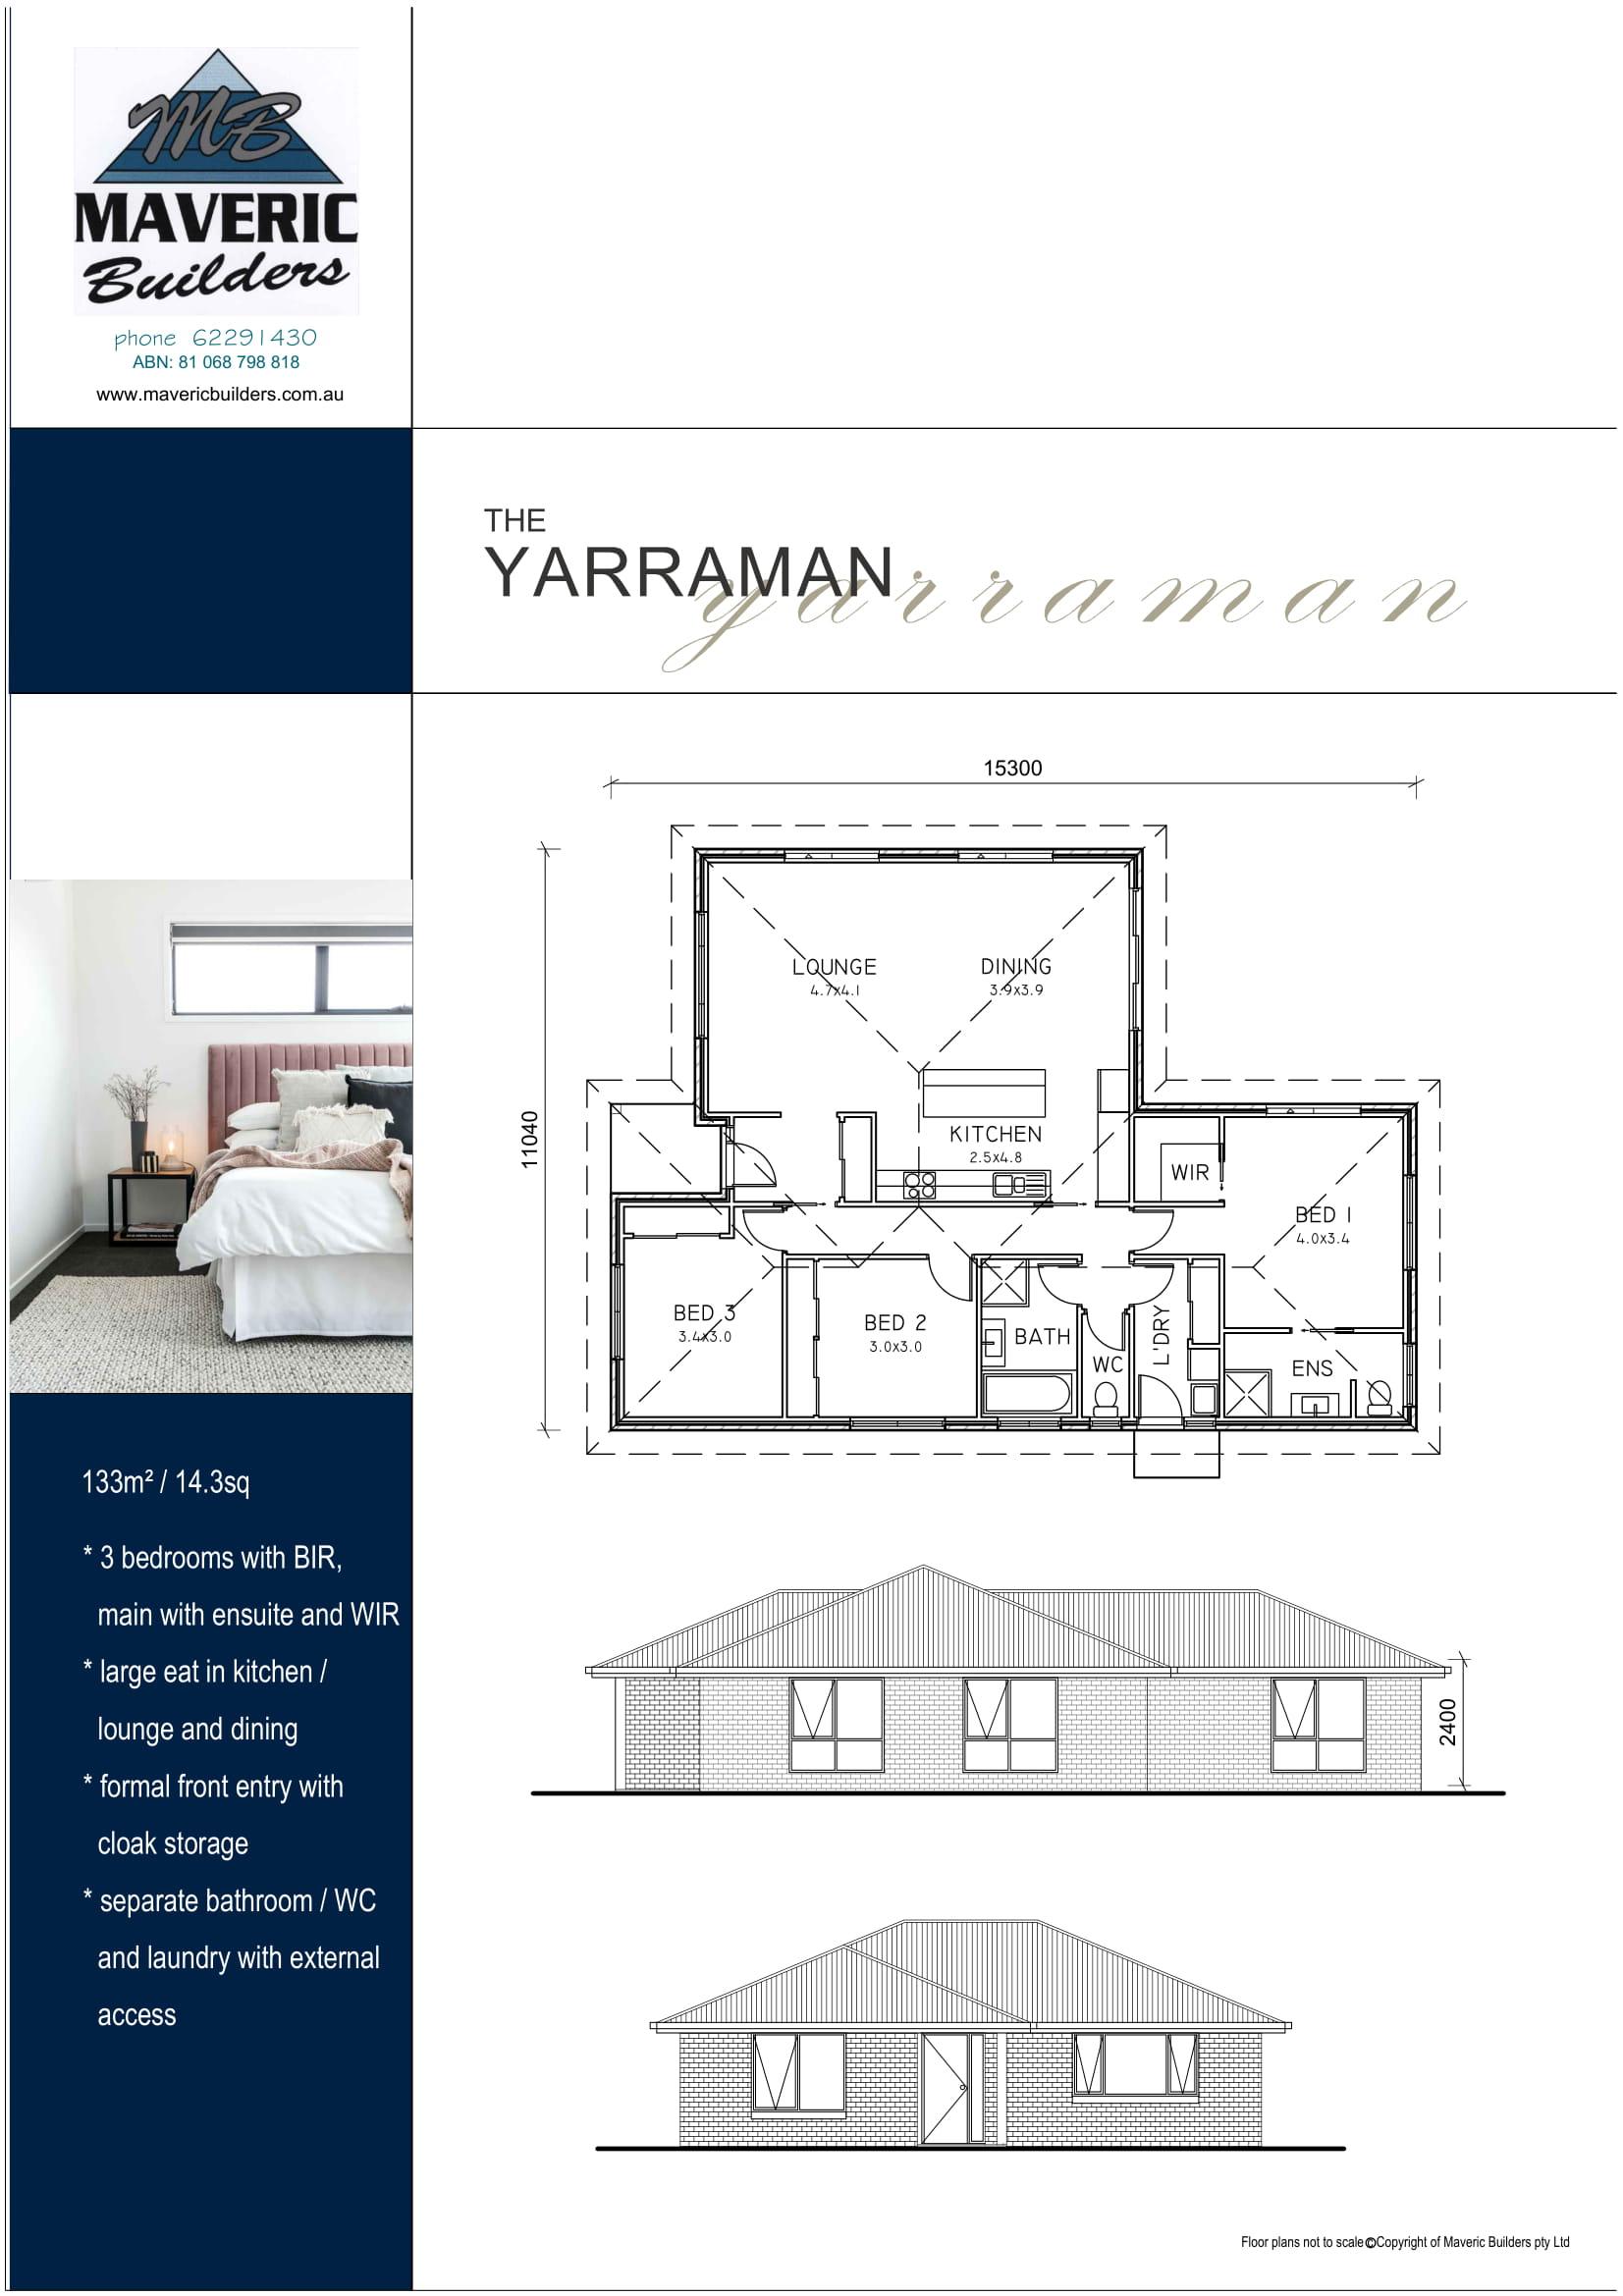 A4 Brochures 2019 01 - 24-10.jpg